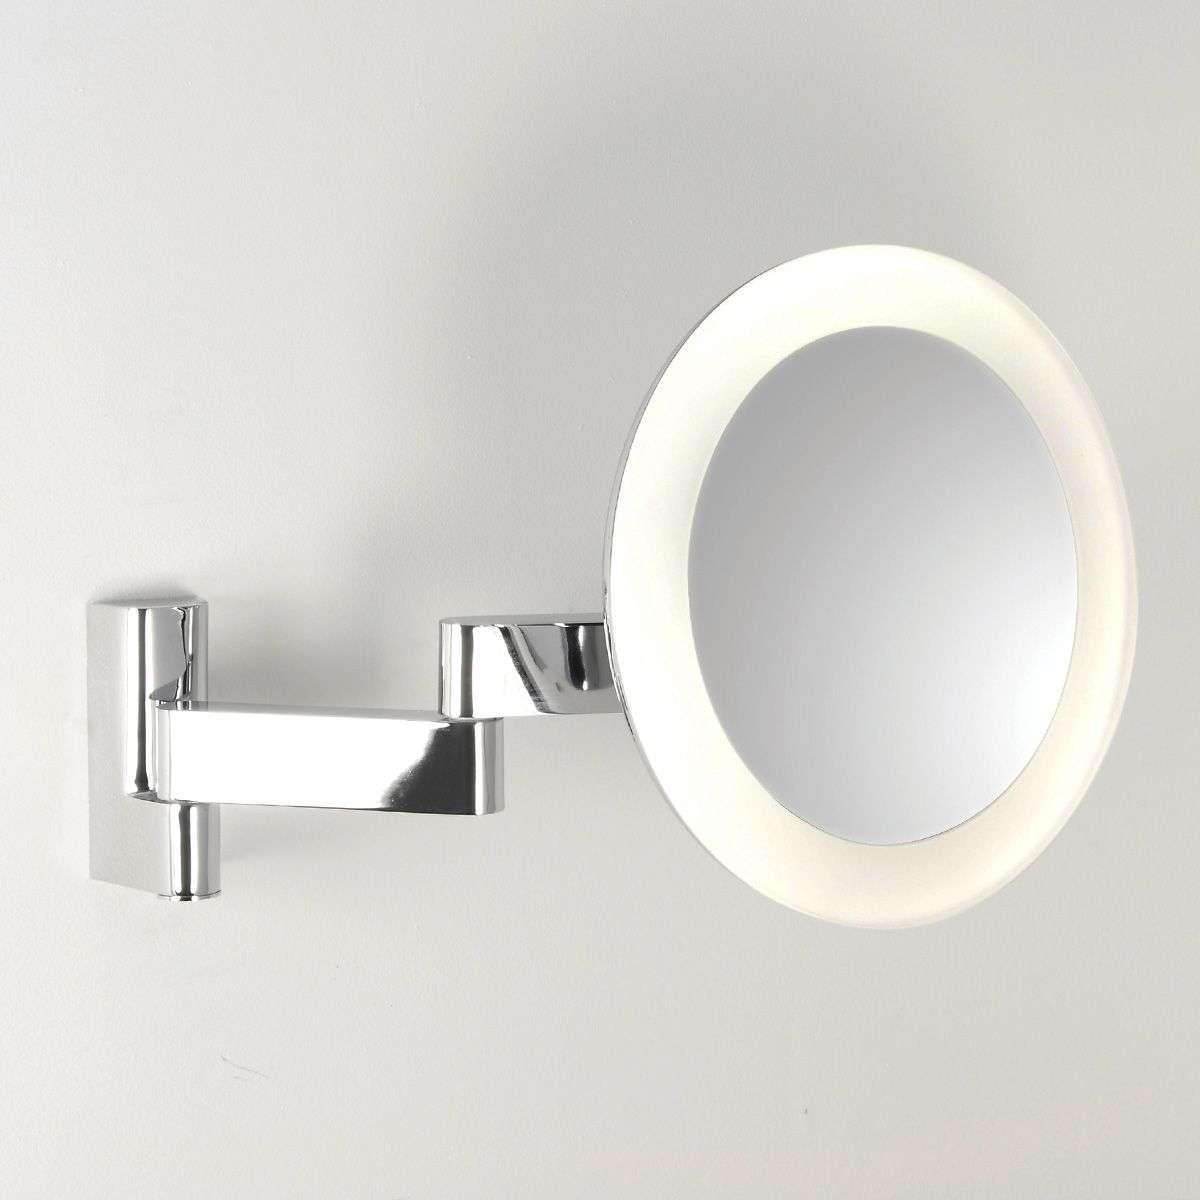 Meikkipeili Niimi Round LED-valaistuksella-1020021-32